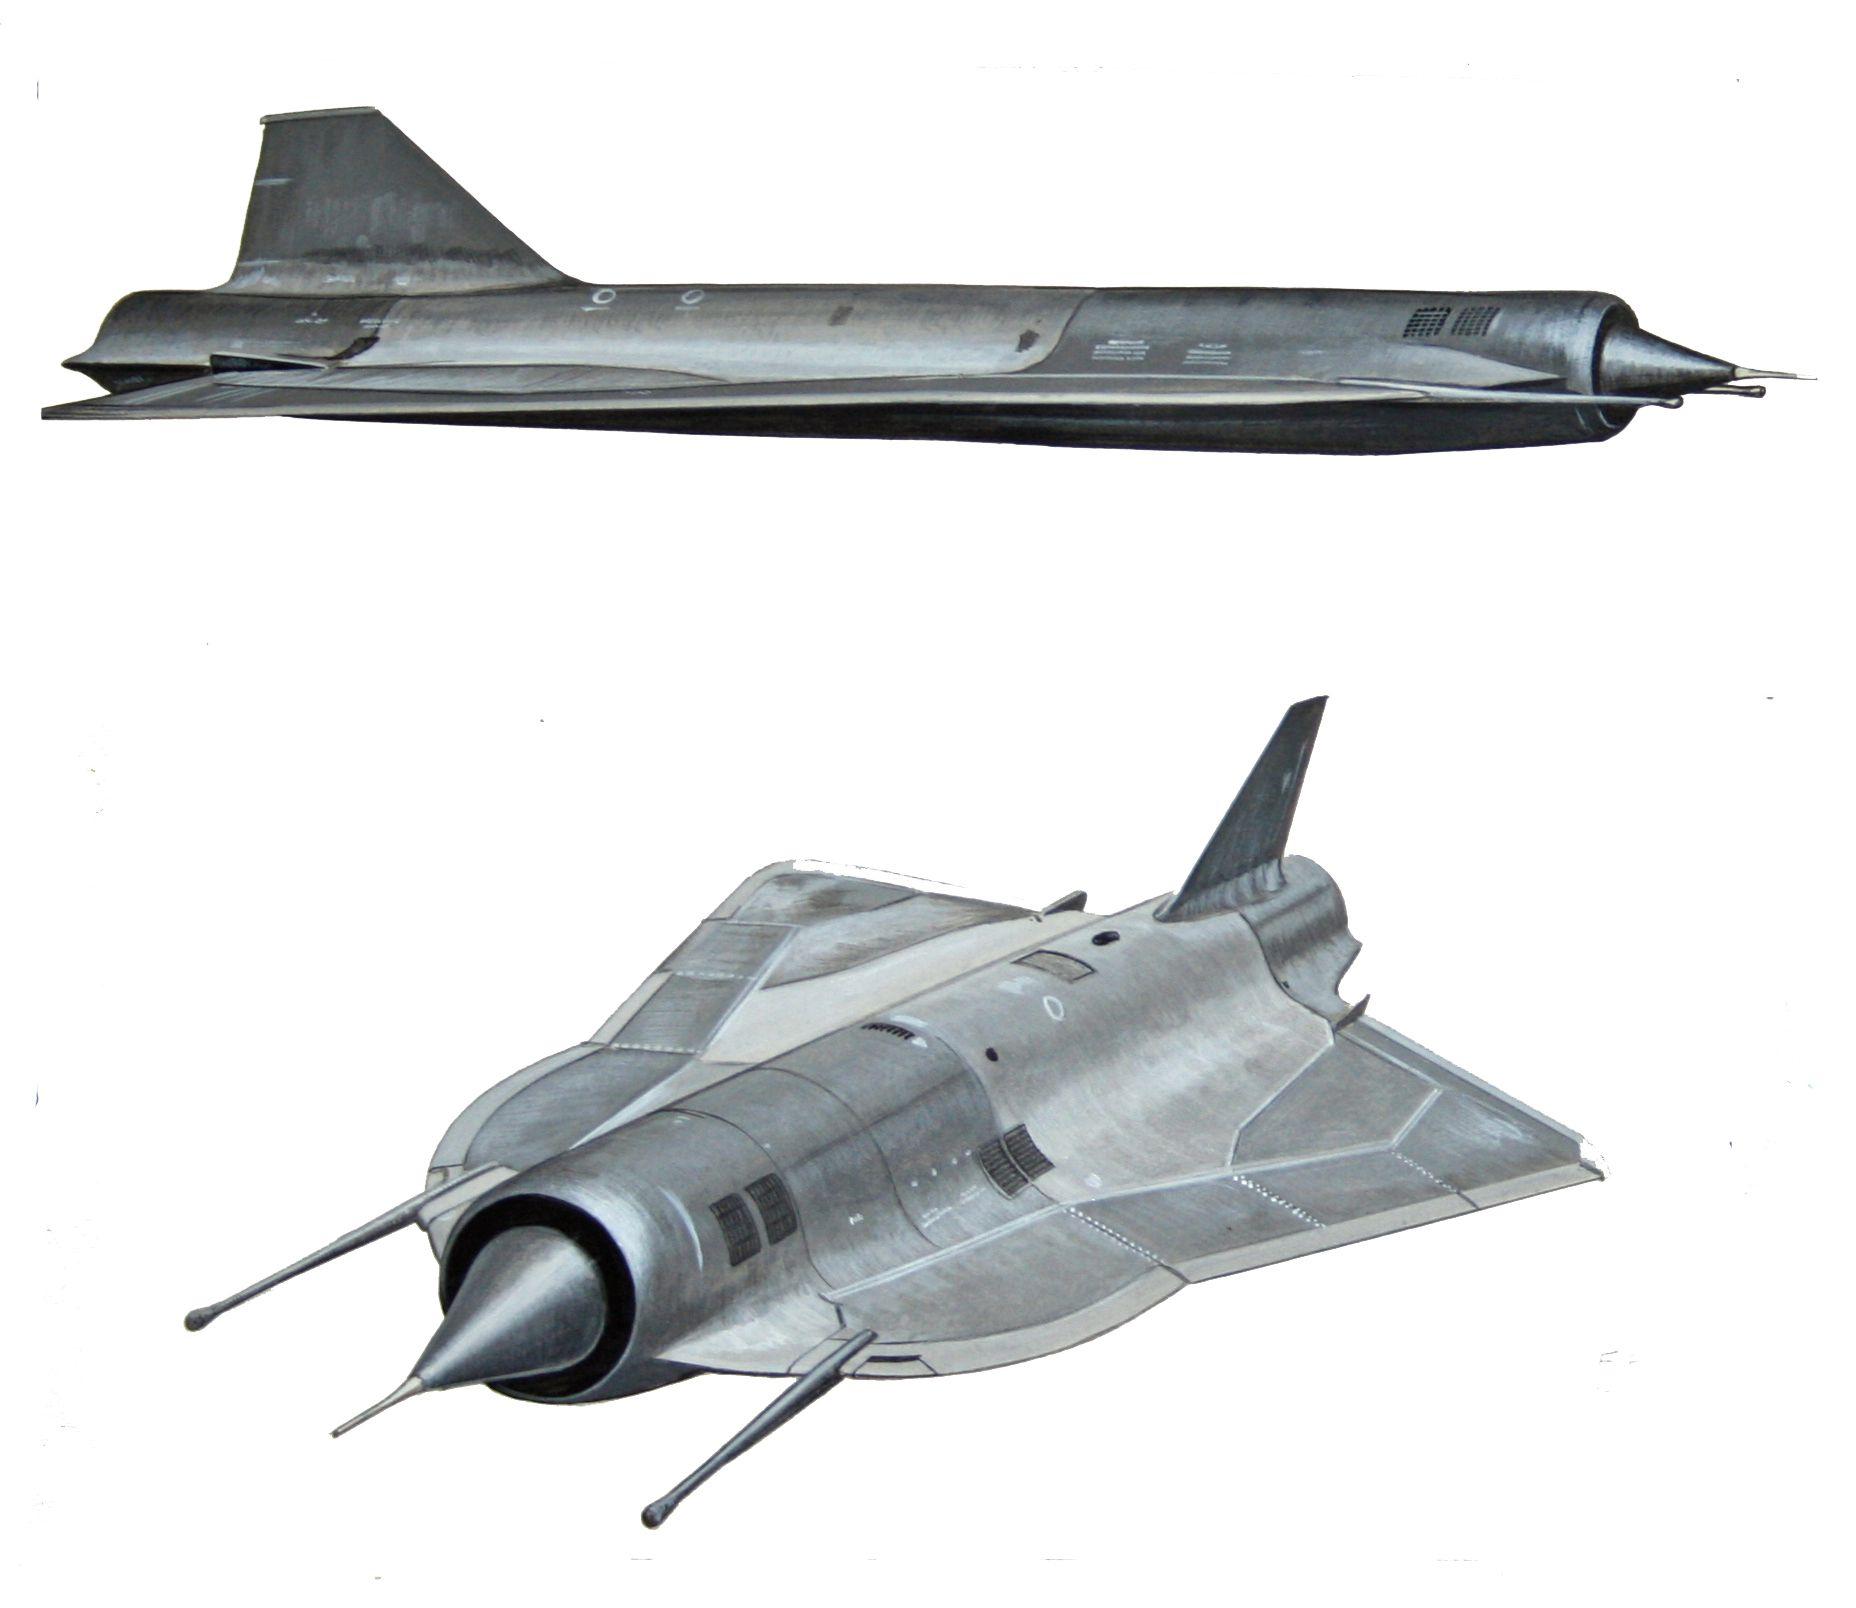 Paper Models Of The SR-71 Blackbird - Bing Images